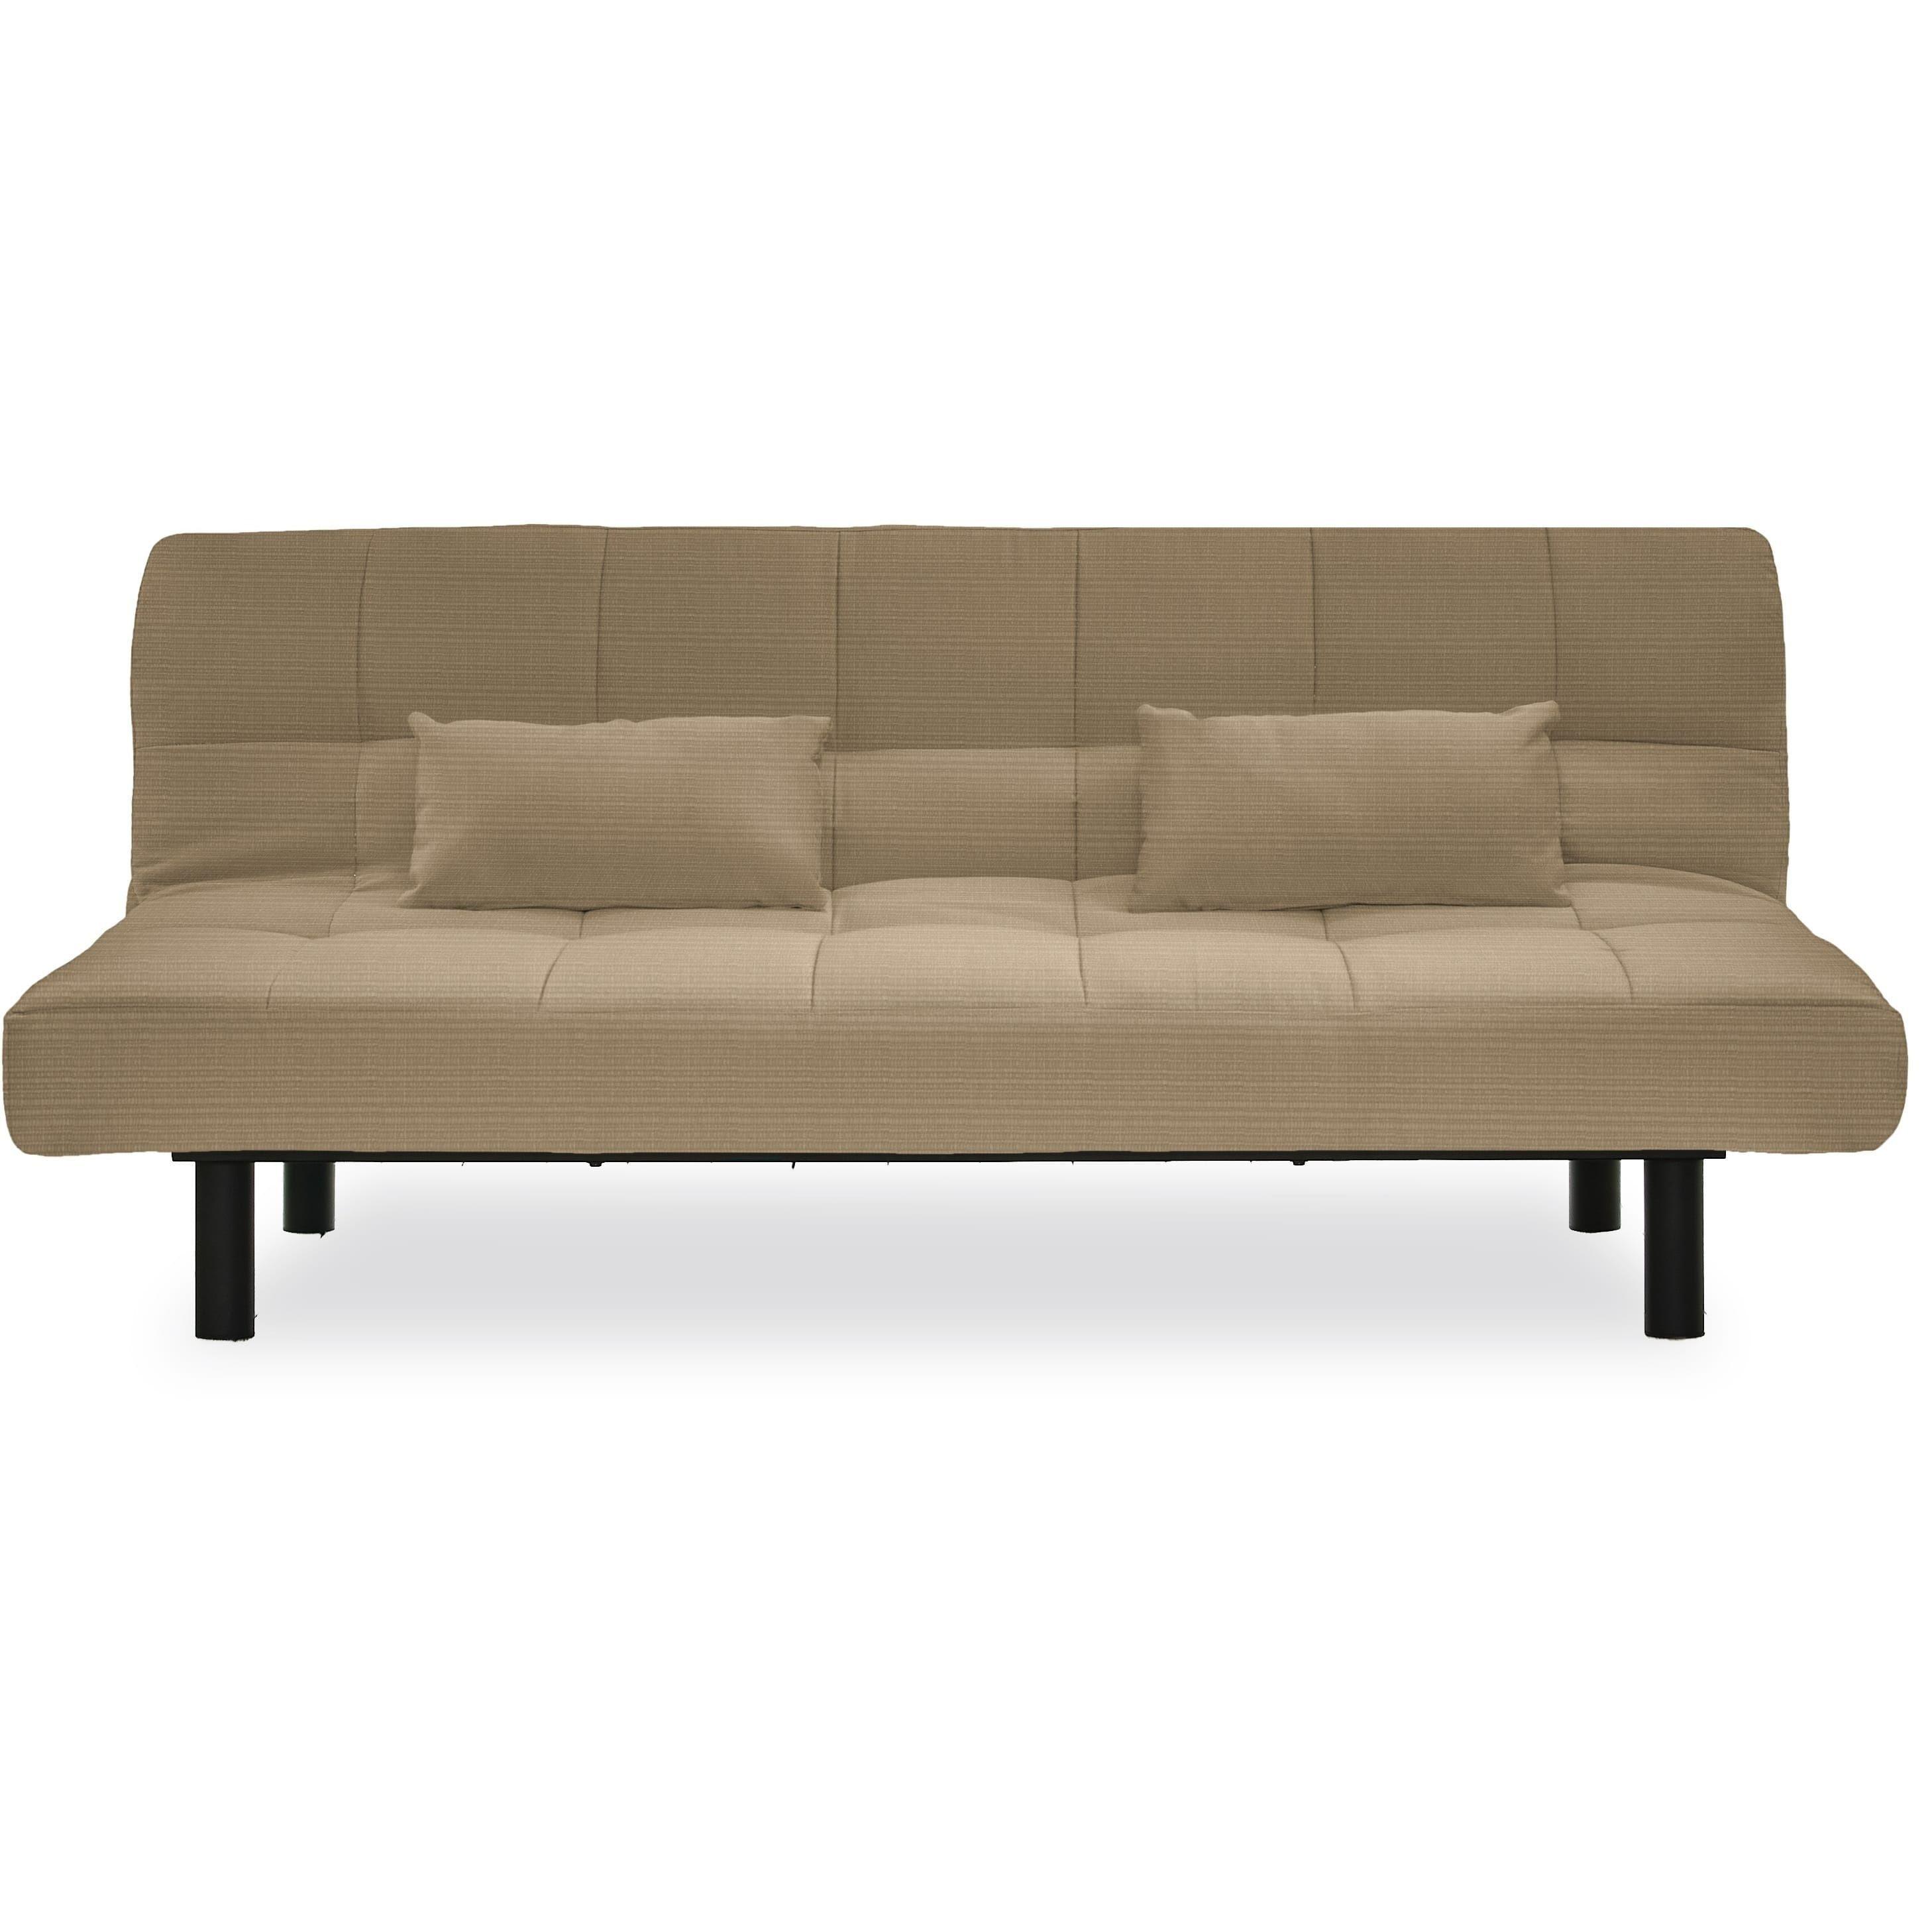 Serta Santa Cruz Brown Pool And Deck Convertible Sofa By Lifestyle Solutions Sand